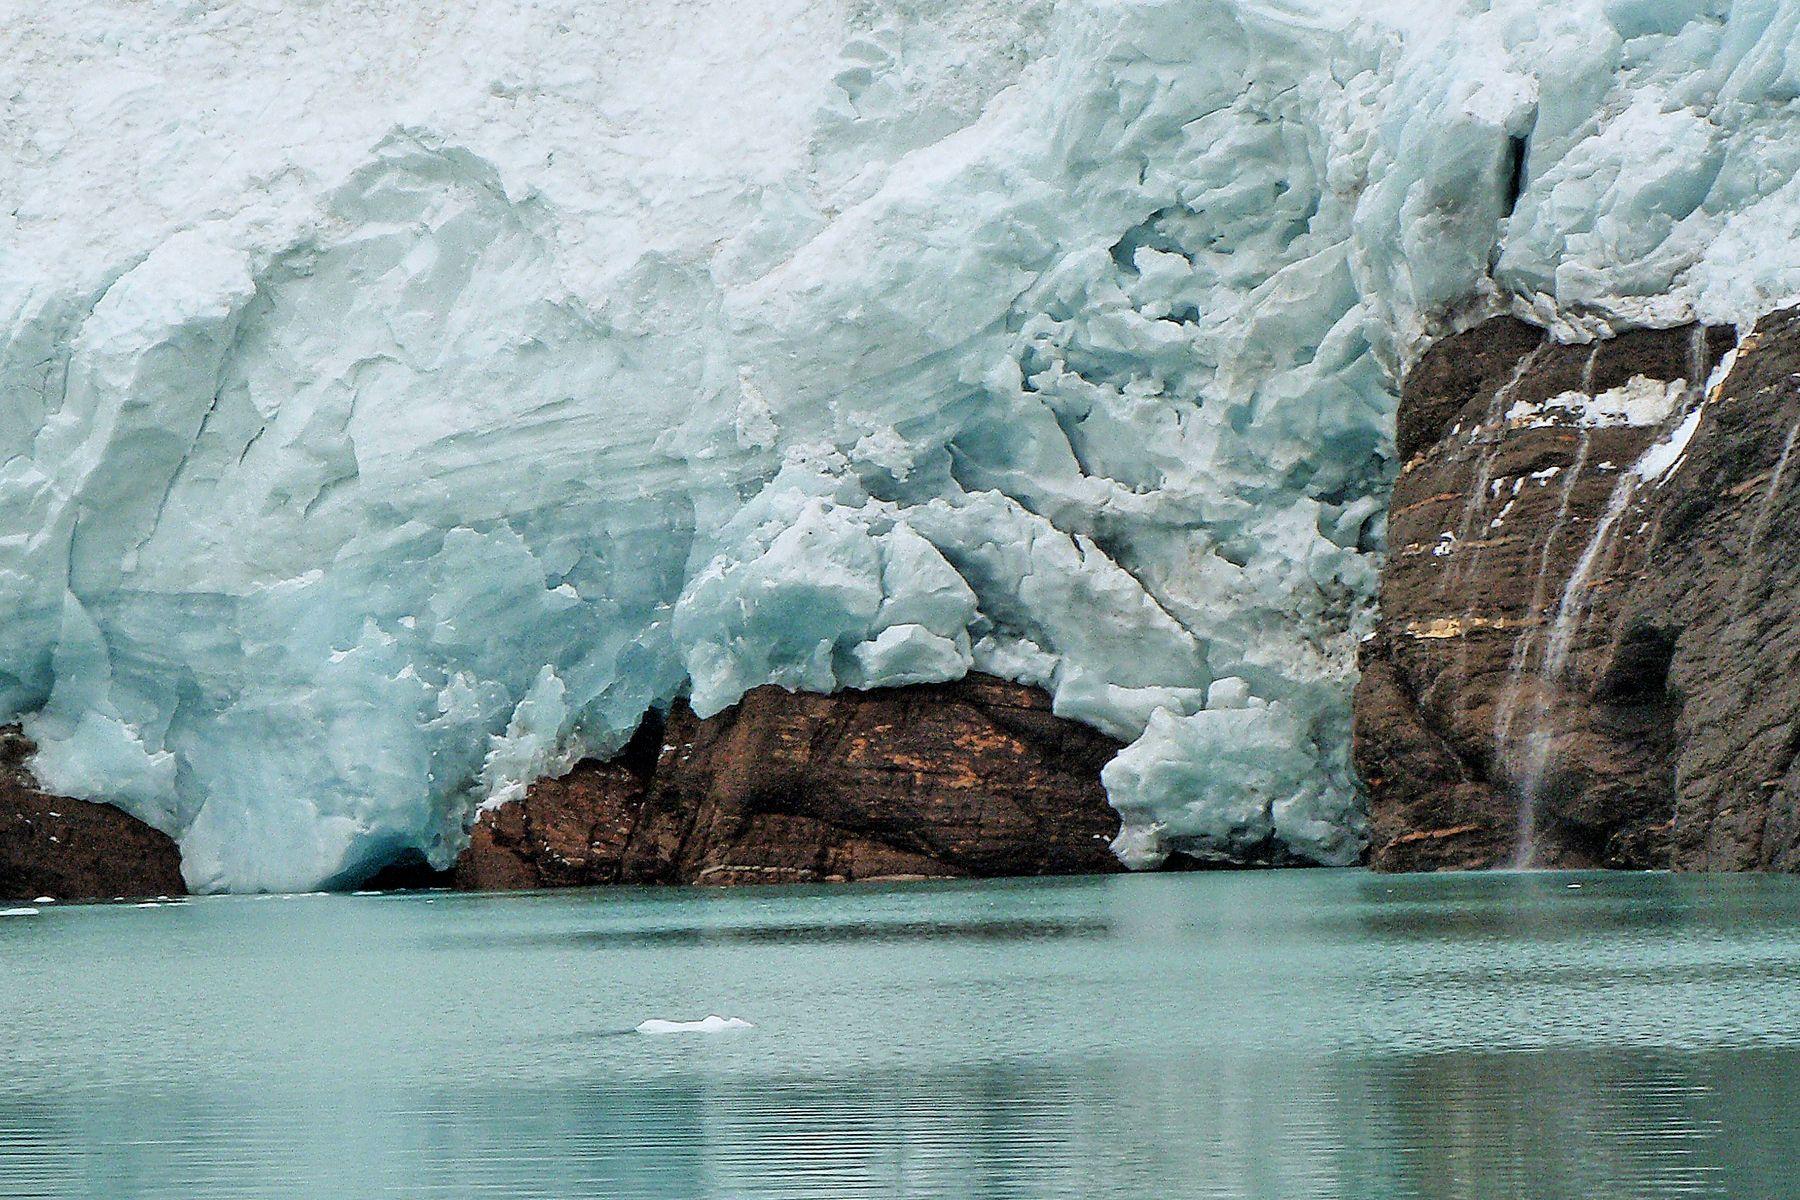 Berg Lake Mout Robson